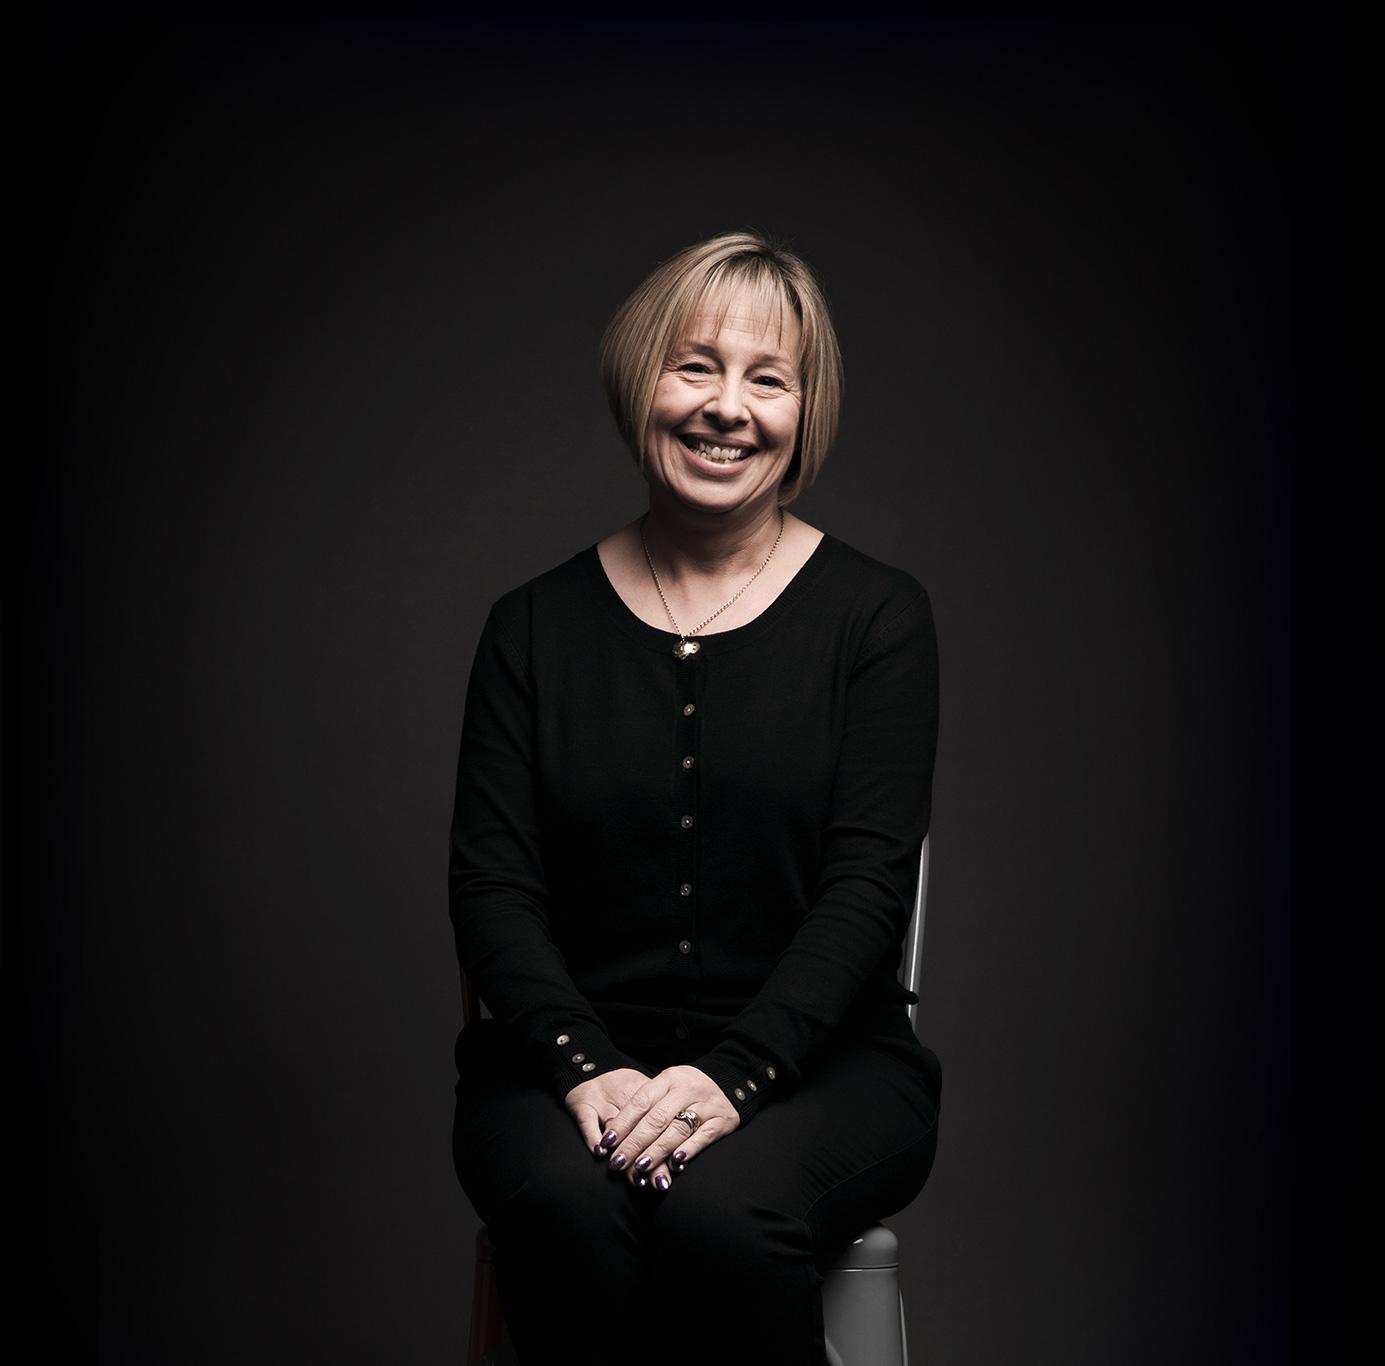 Jane Clapshaw